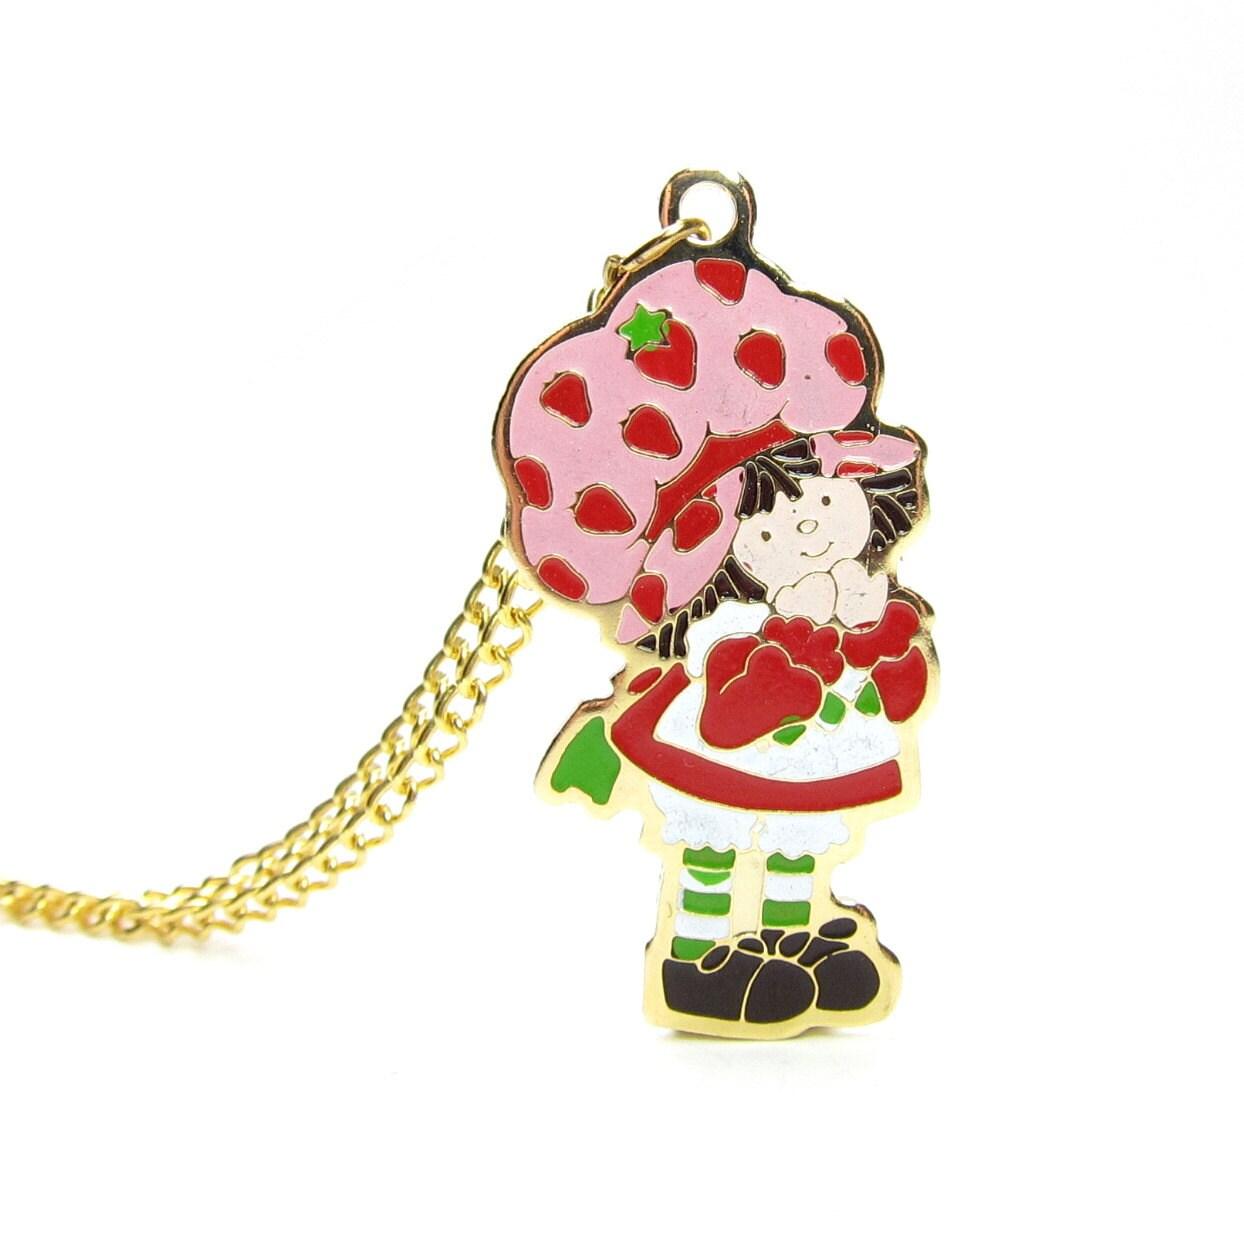 Strawberry shortcake necklace gold vintage 1980 enameled charm for Strawberry shortcake necklace jewelry